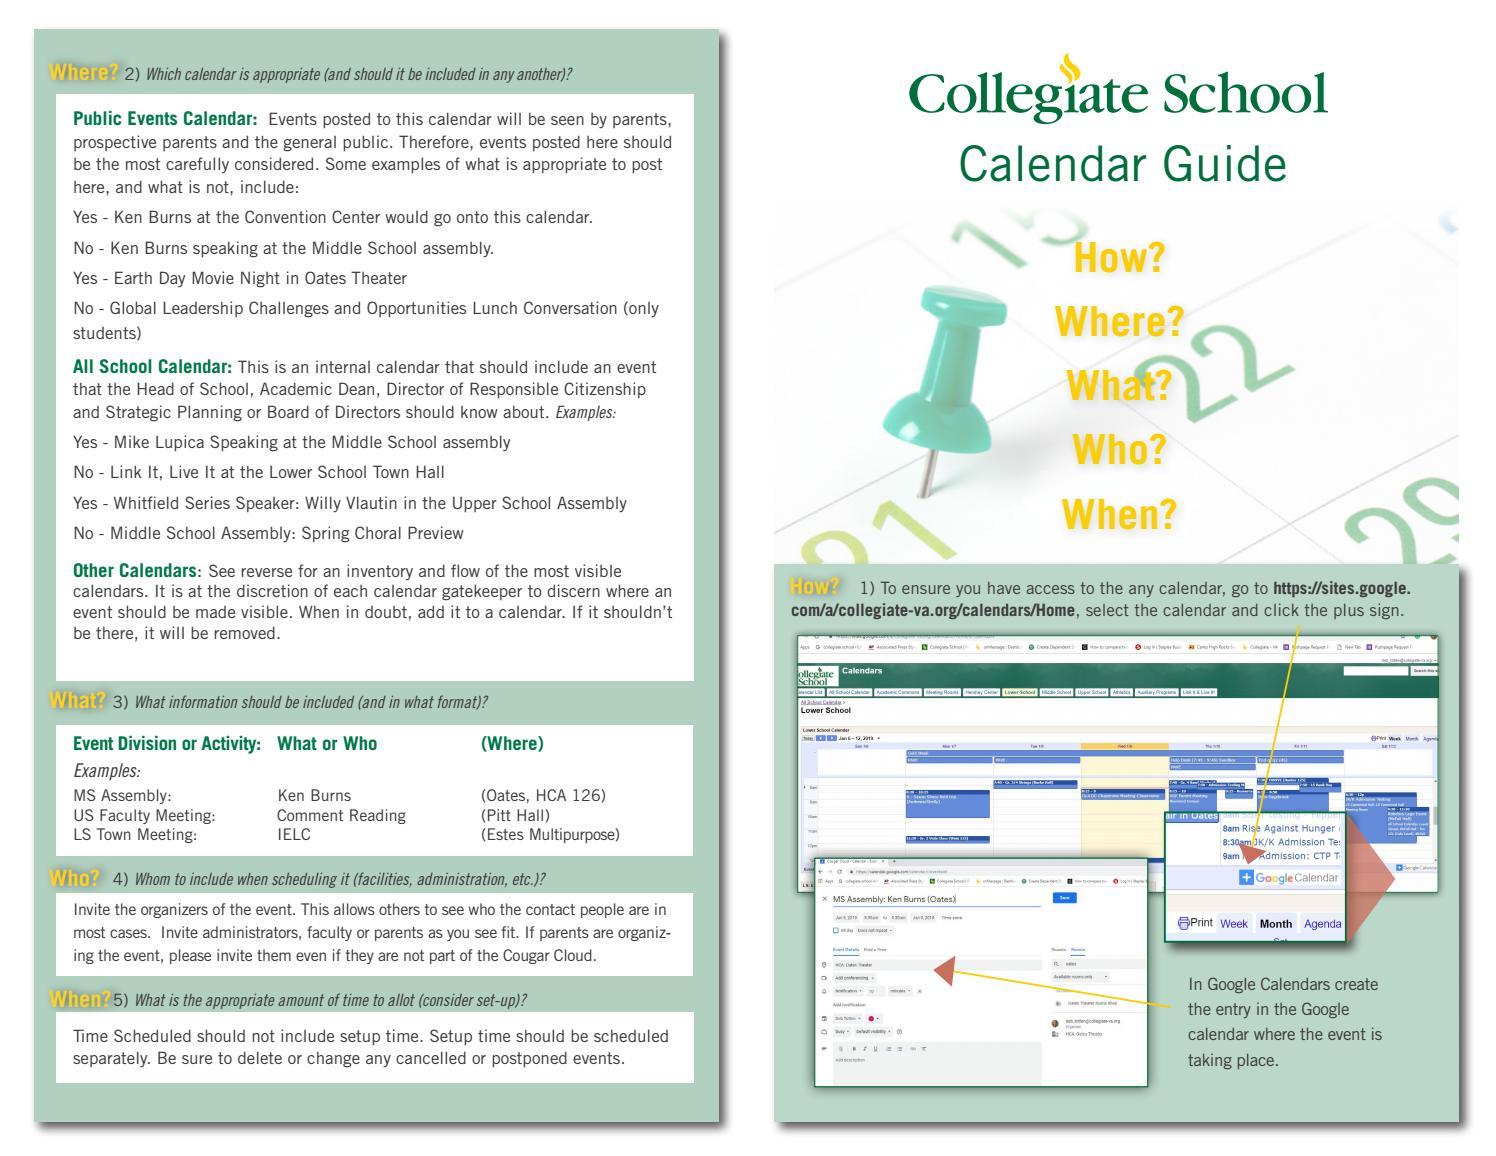 Pitt Academic Calendar.Calendar Governance Handout By Collegiate School Issuu